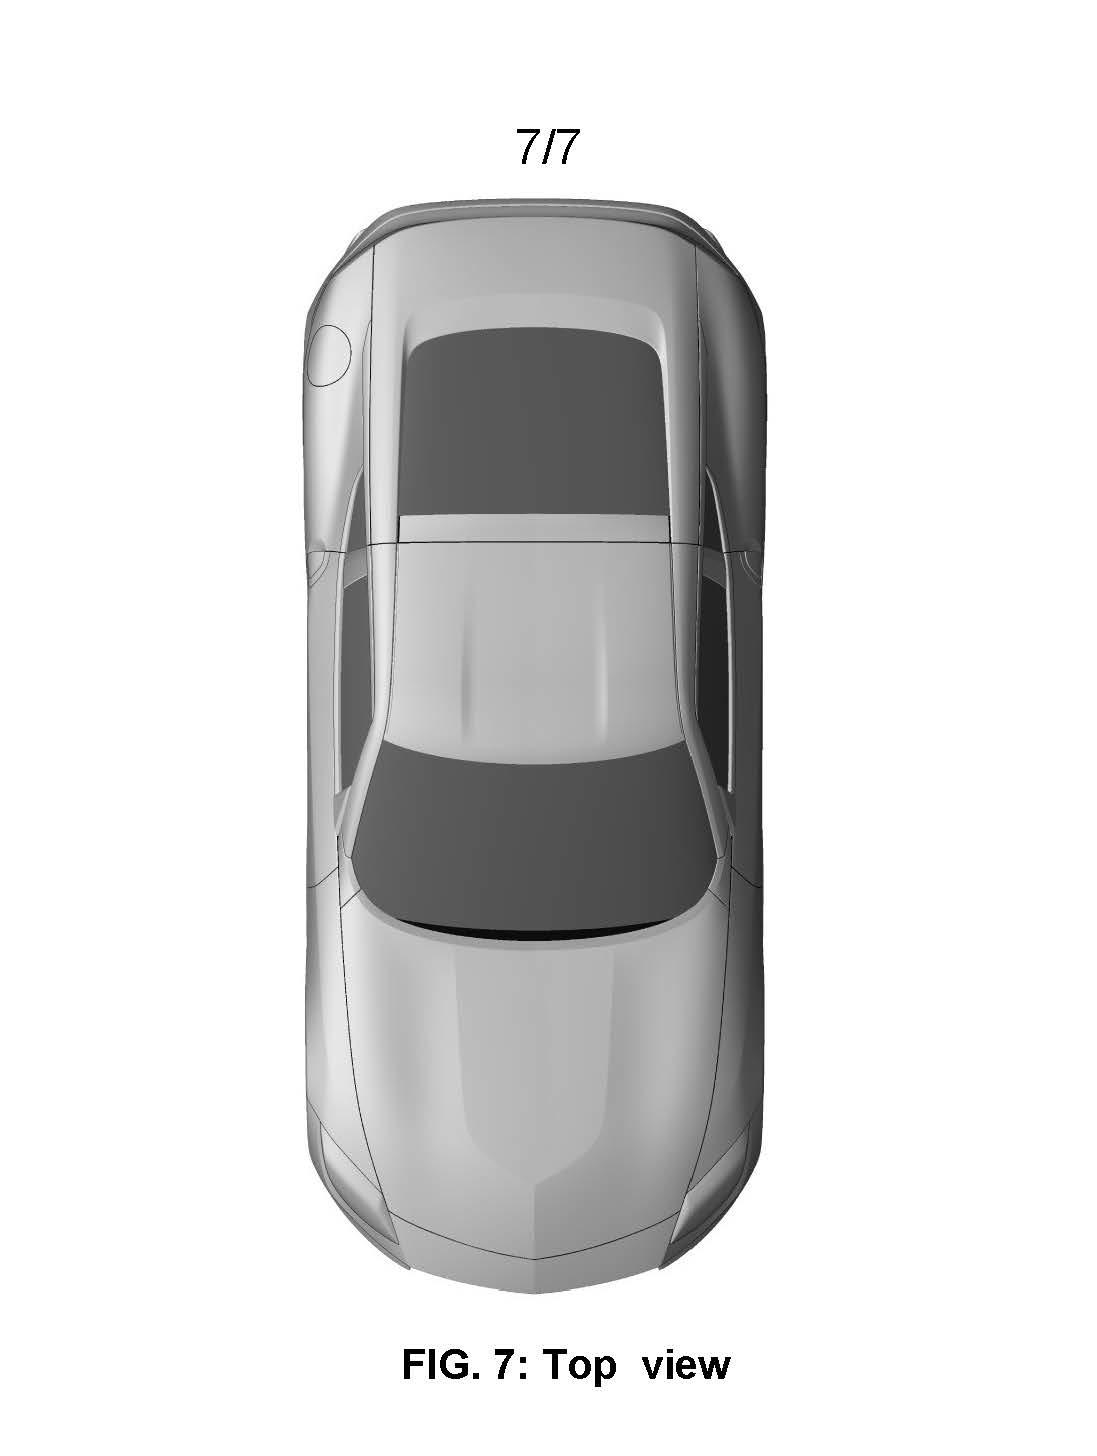 NissanZProto-Z35-patent-07.jpg.jpg